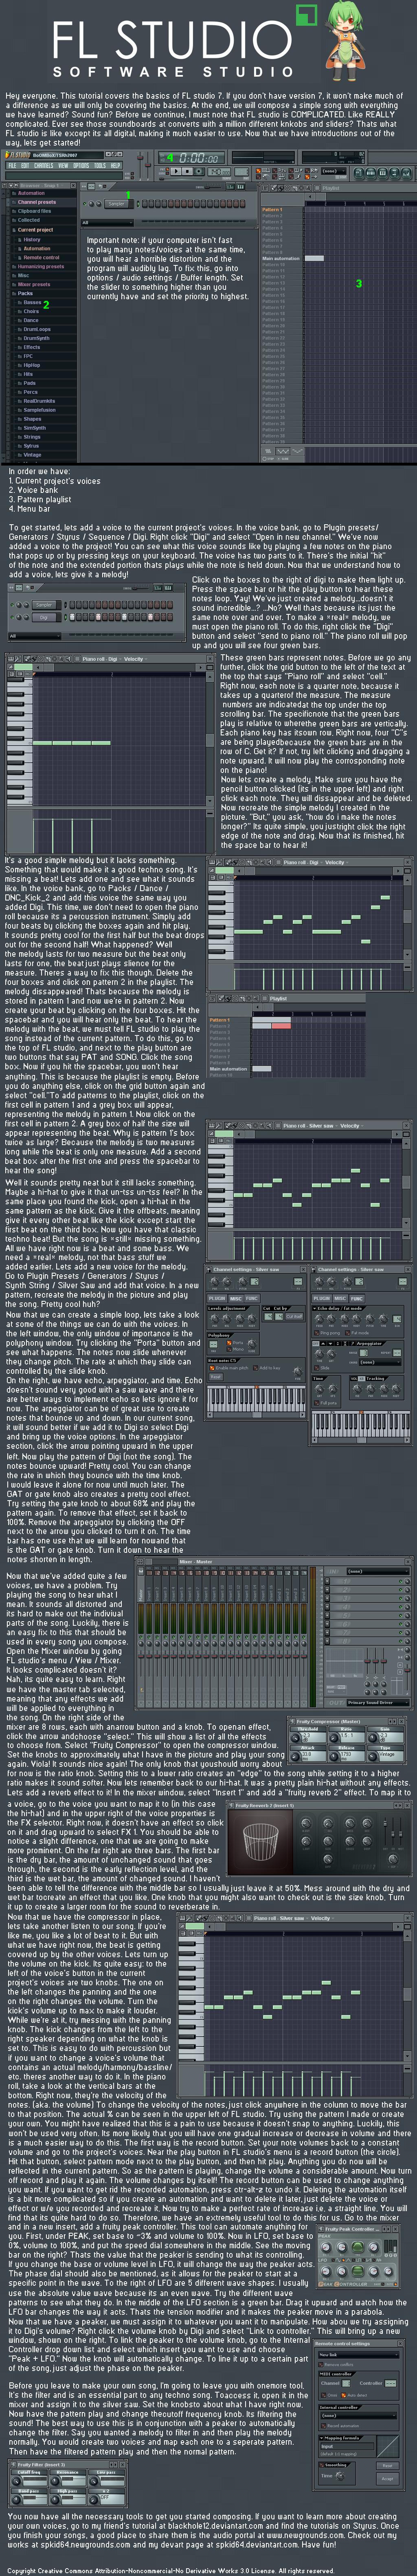 FL studio basic tutorial by NekoChrono